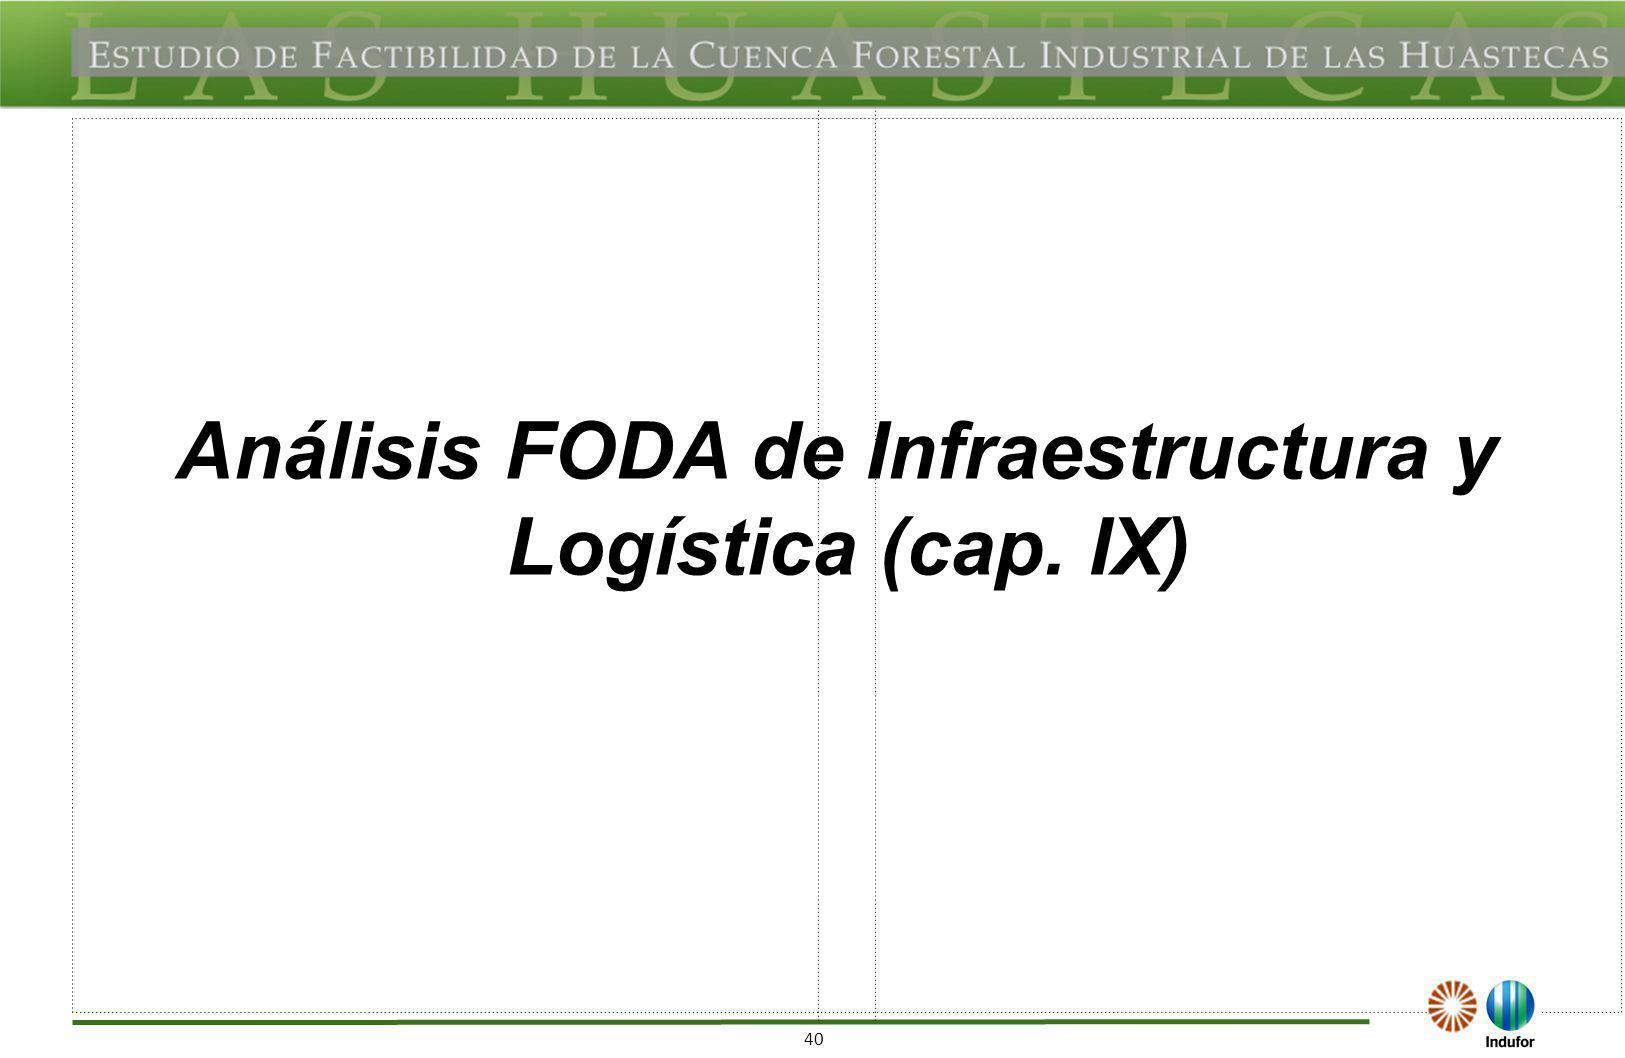 Infraestructura de Transporte